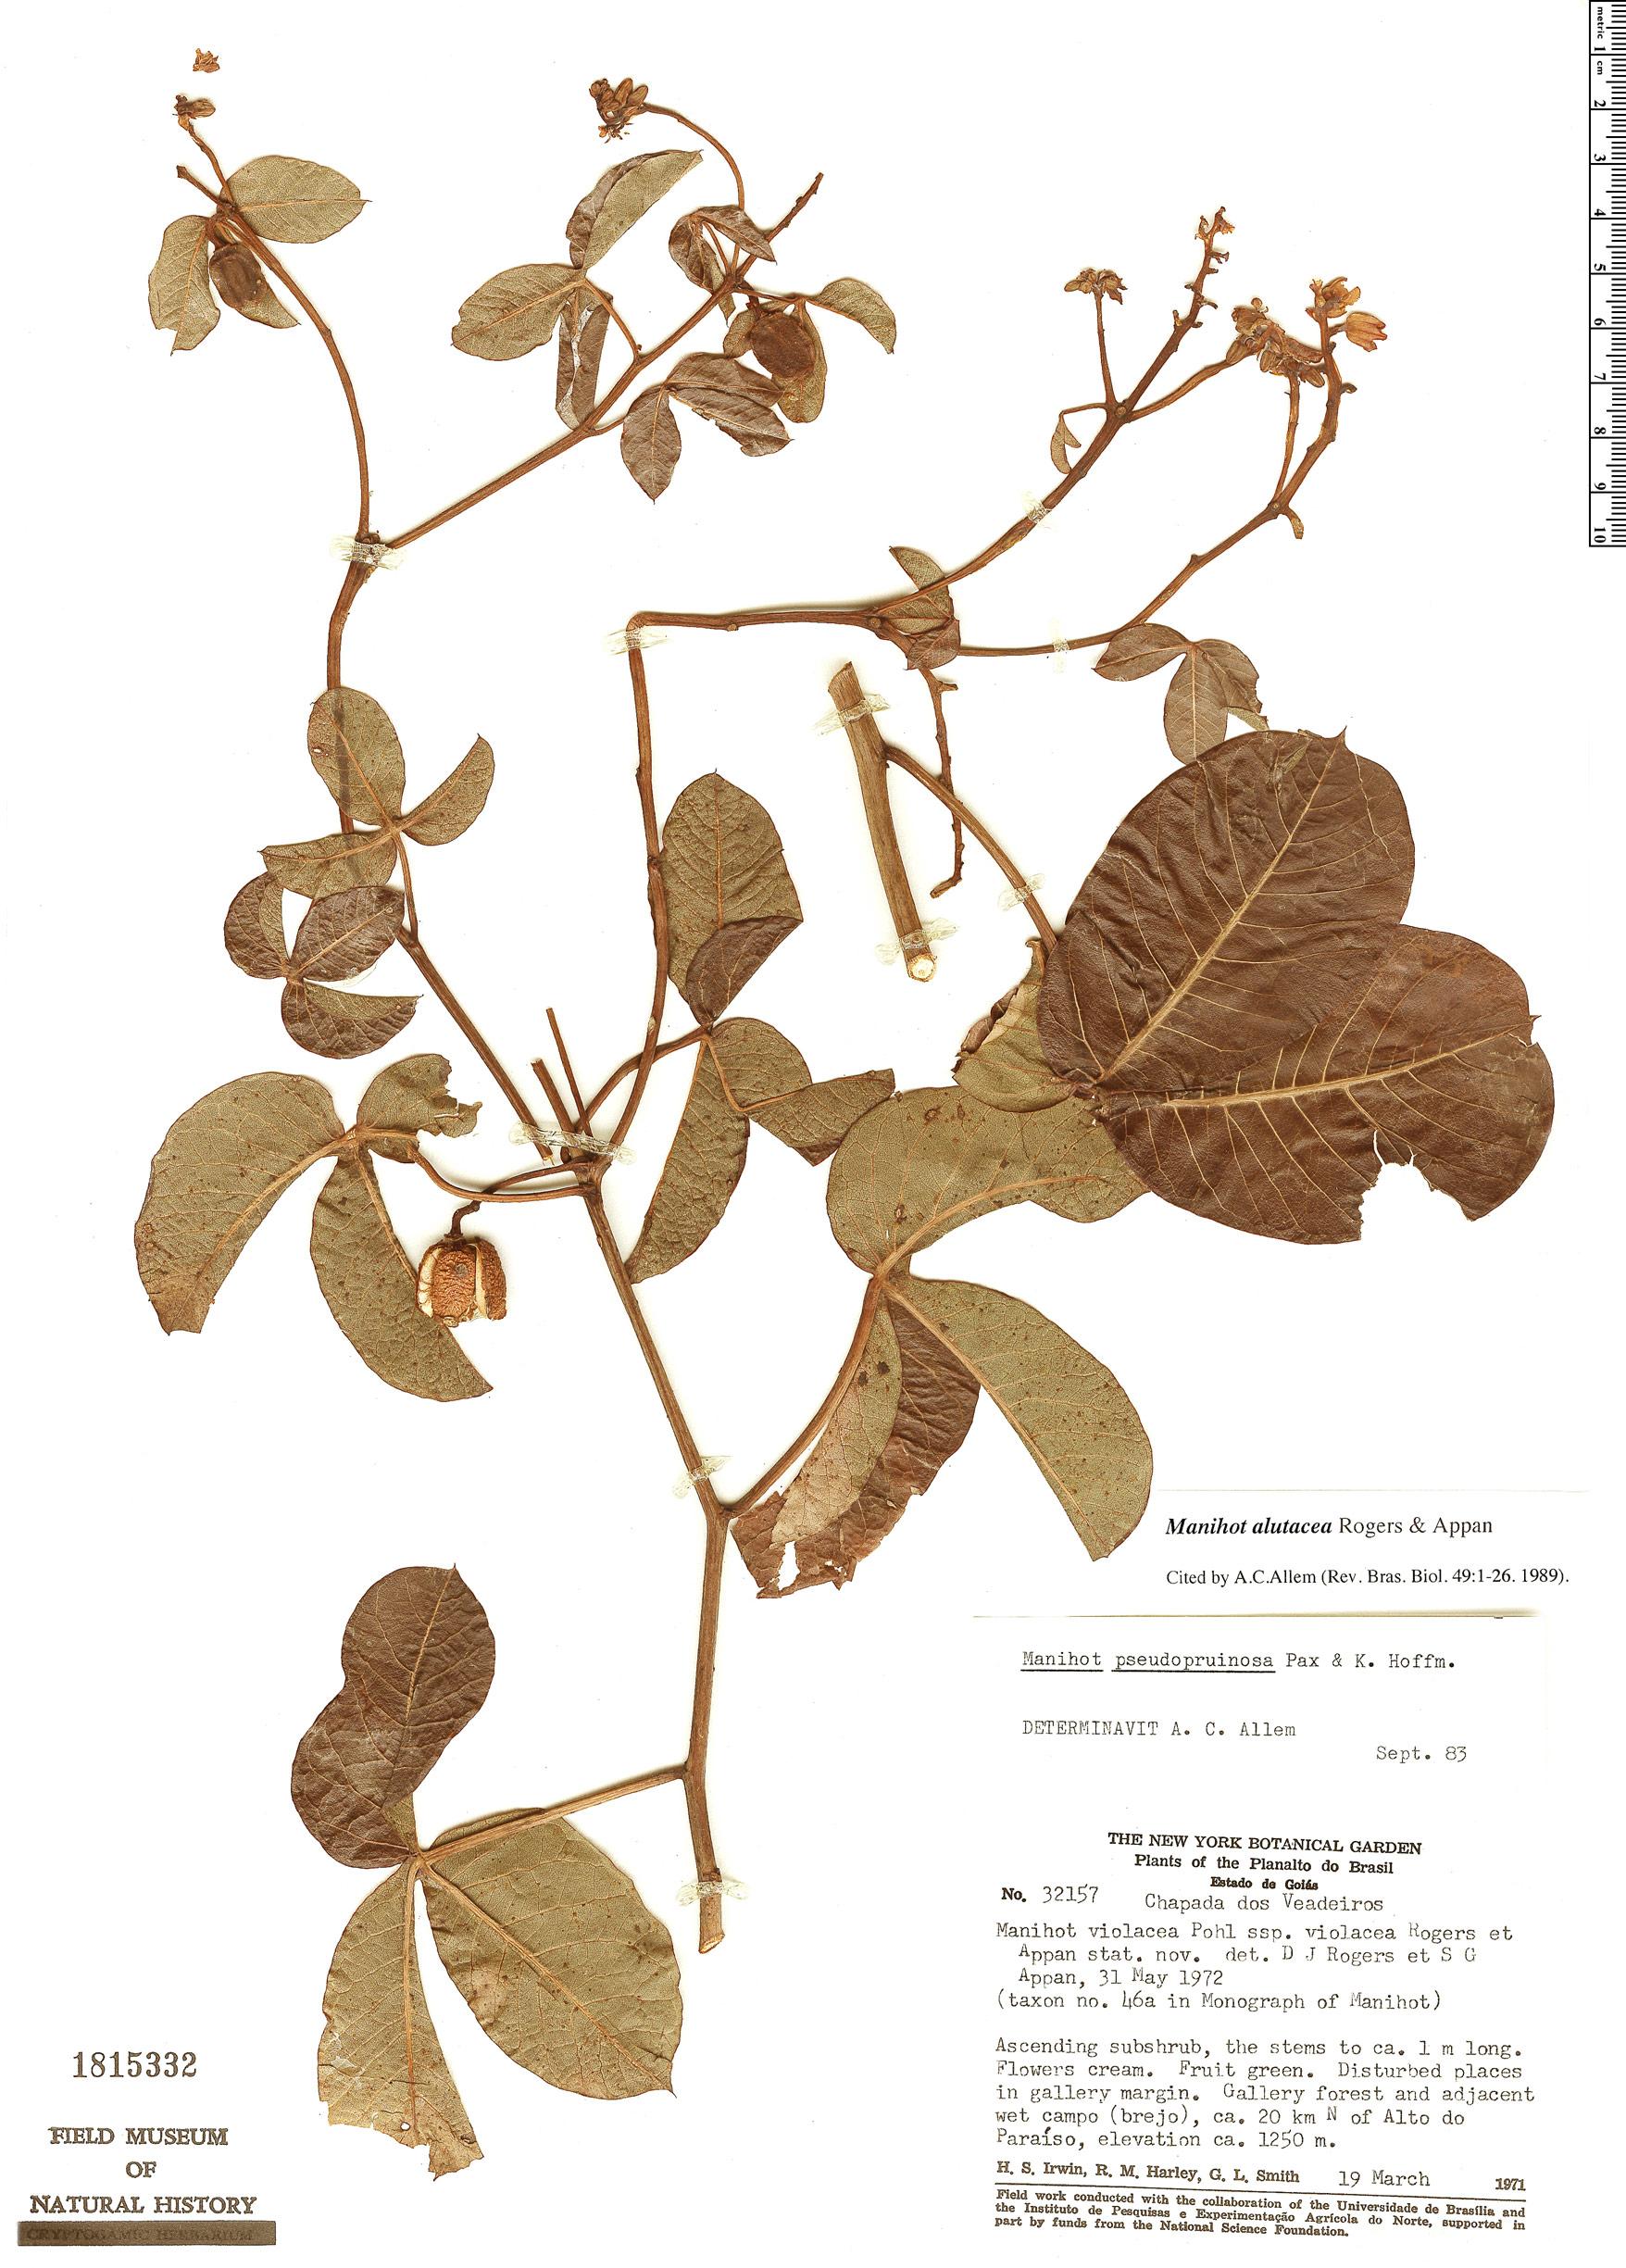 Specimen: Manihot alutacea